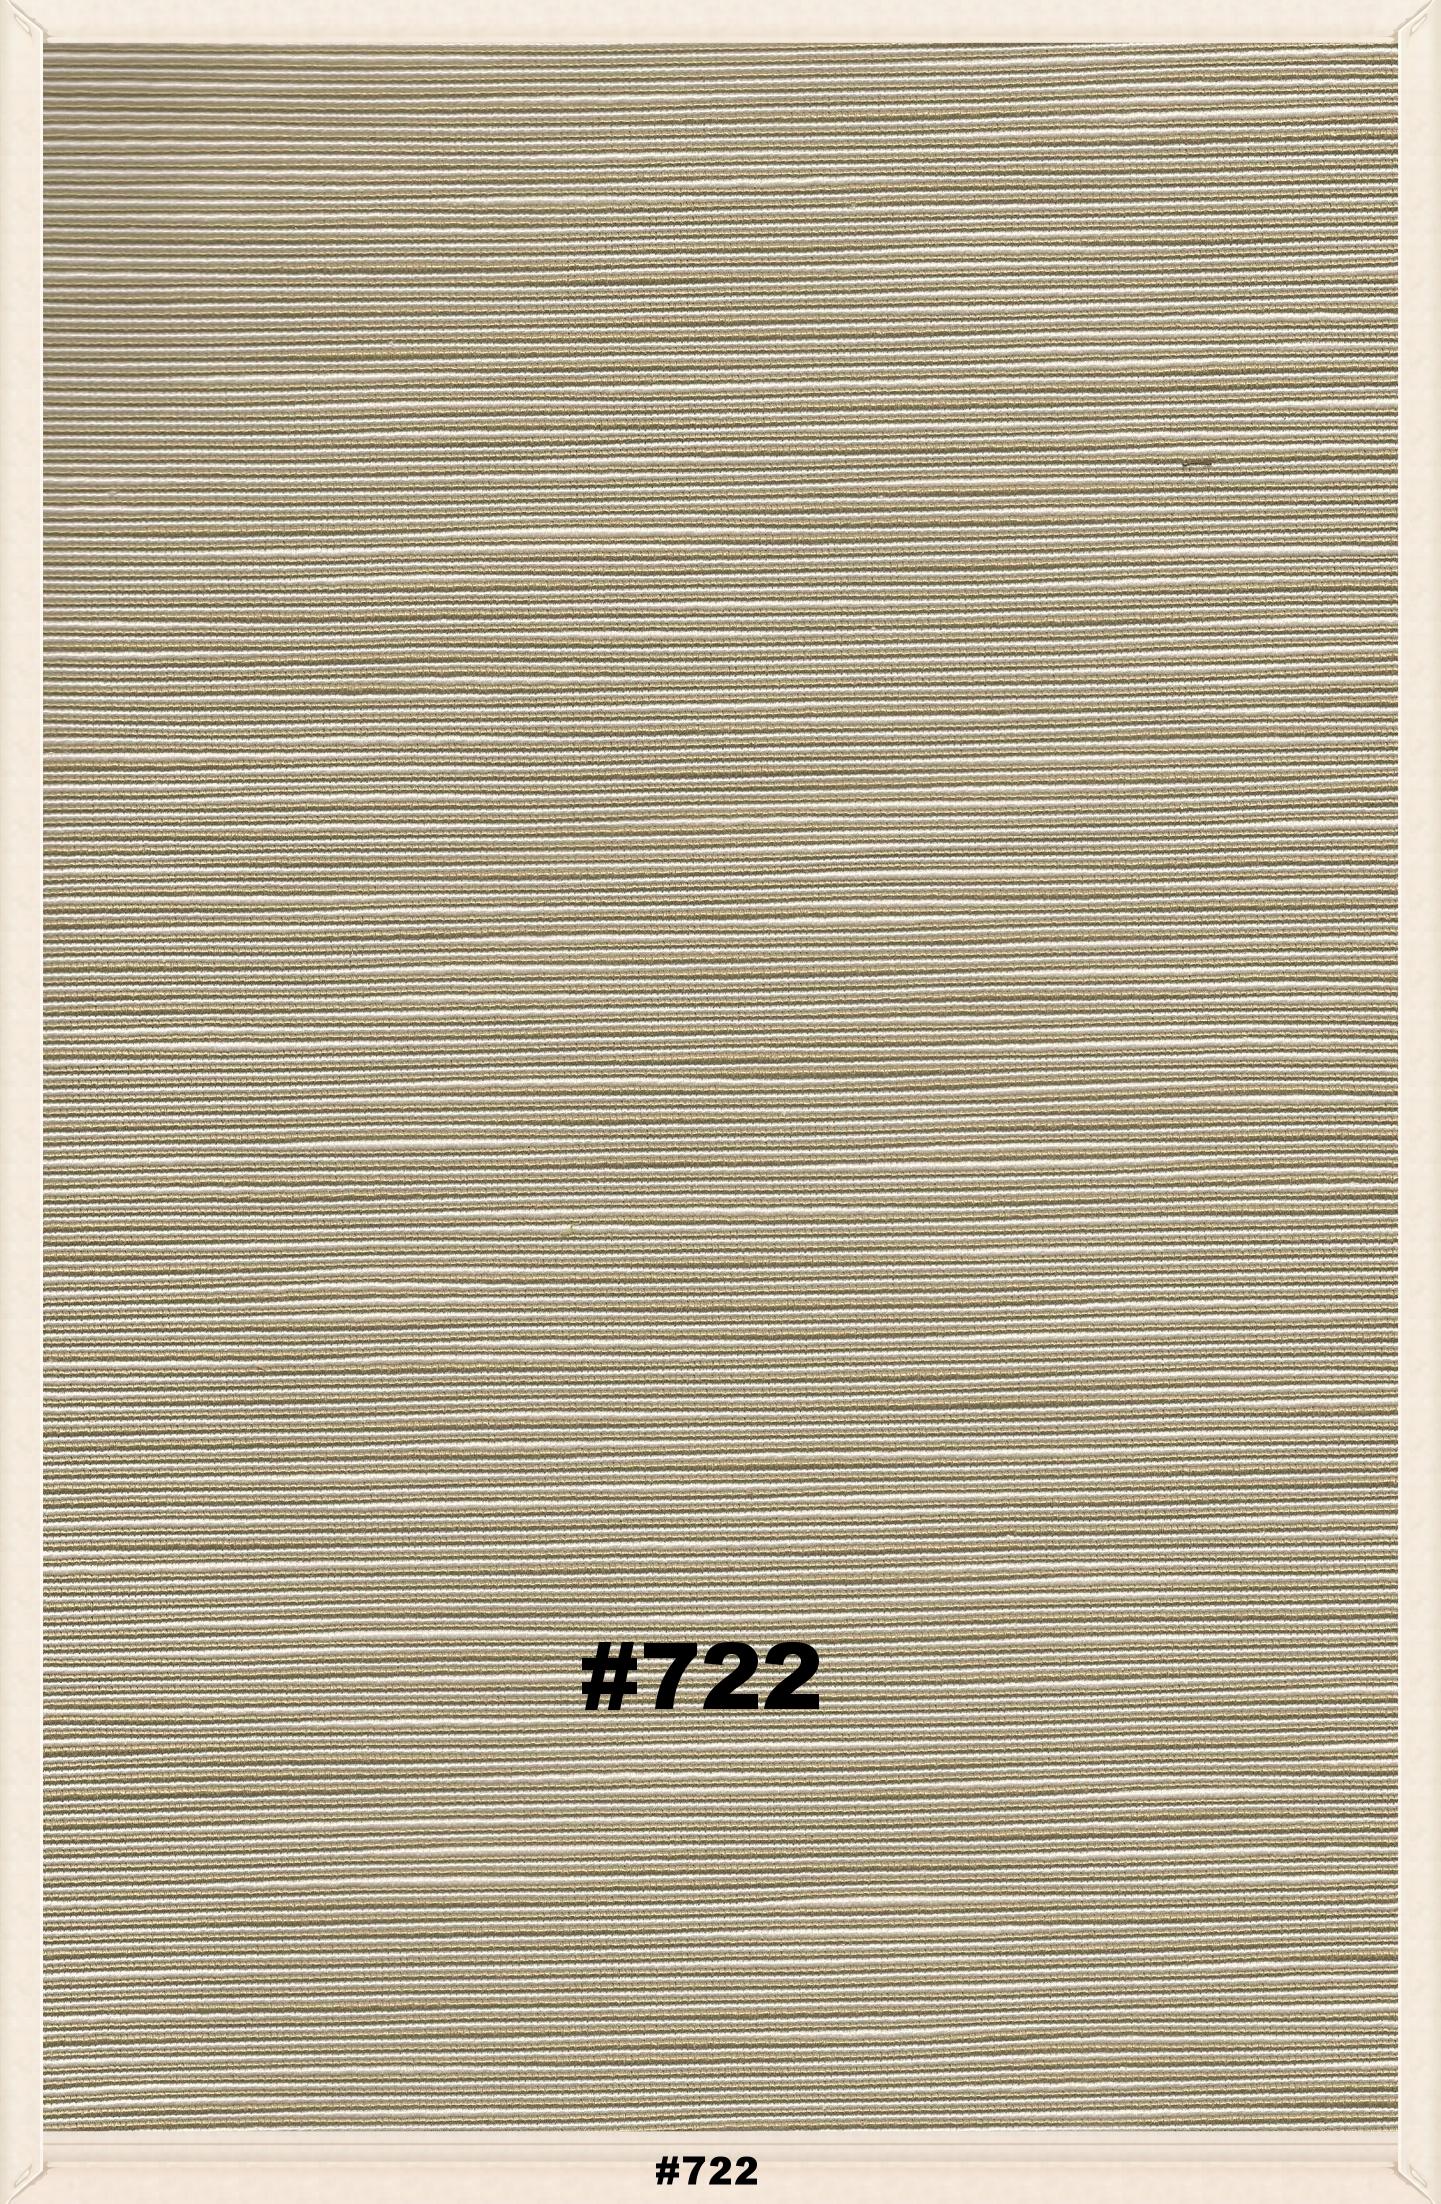 Indoor fabrics 700 series